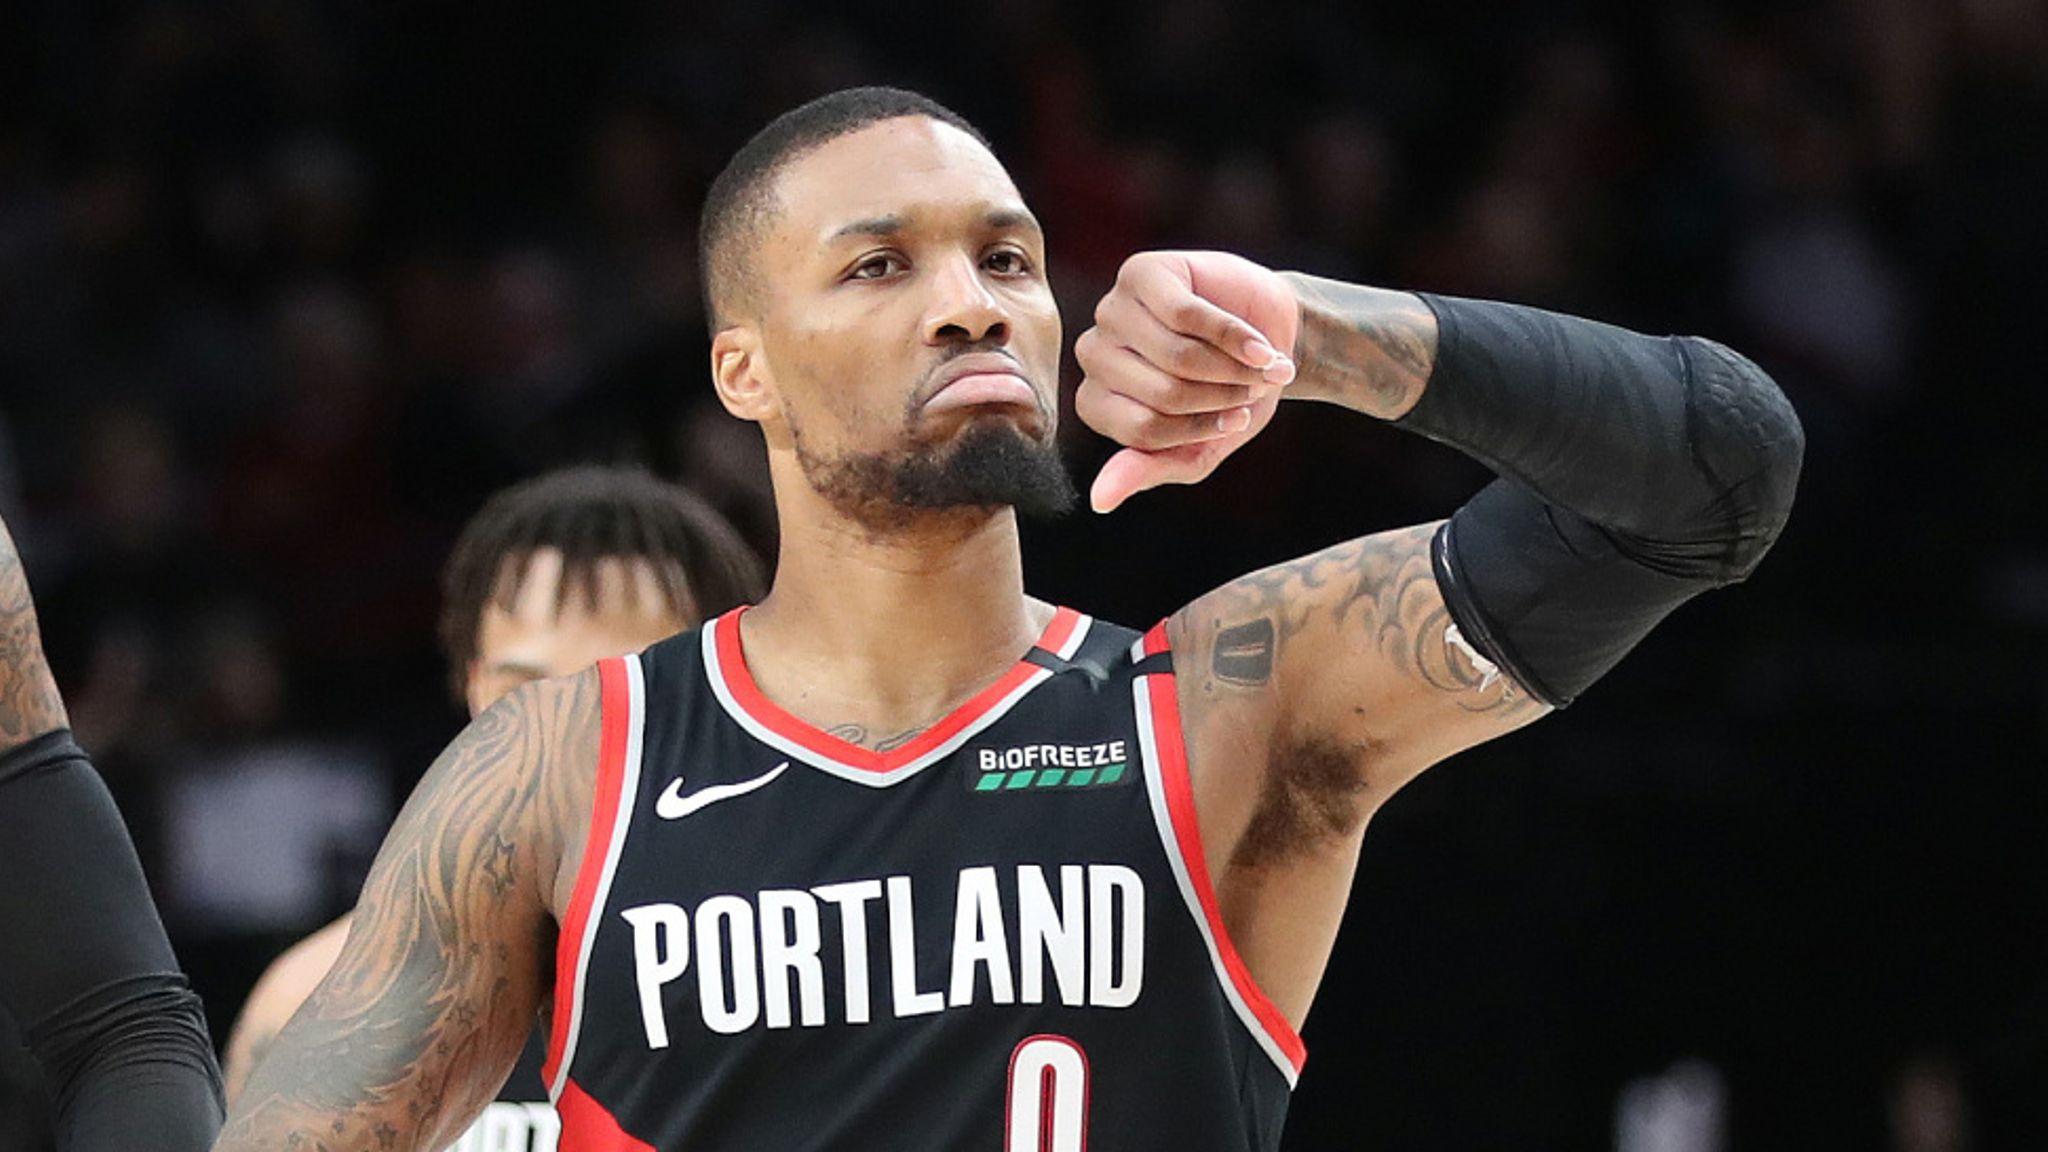 Damian Lillard says Portland's playoff prospects will determine whether he  plays this season   NBA News   Sky Sports